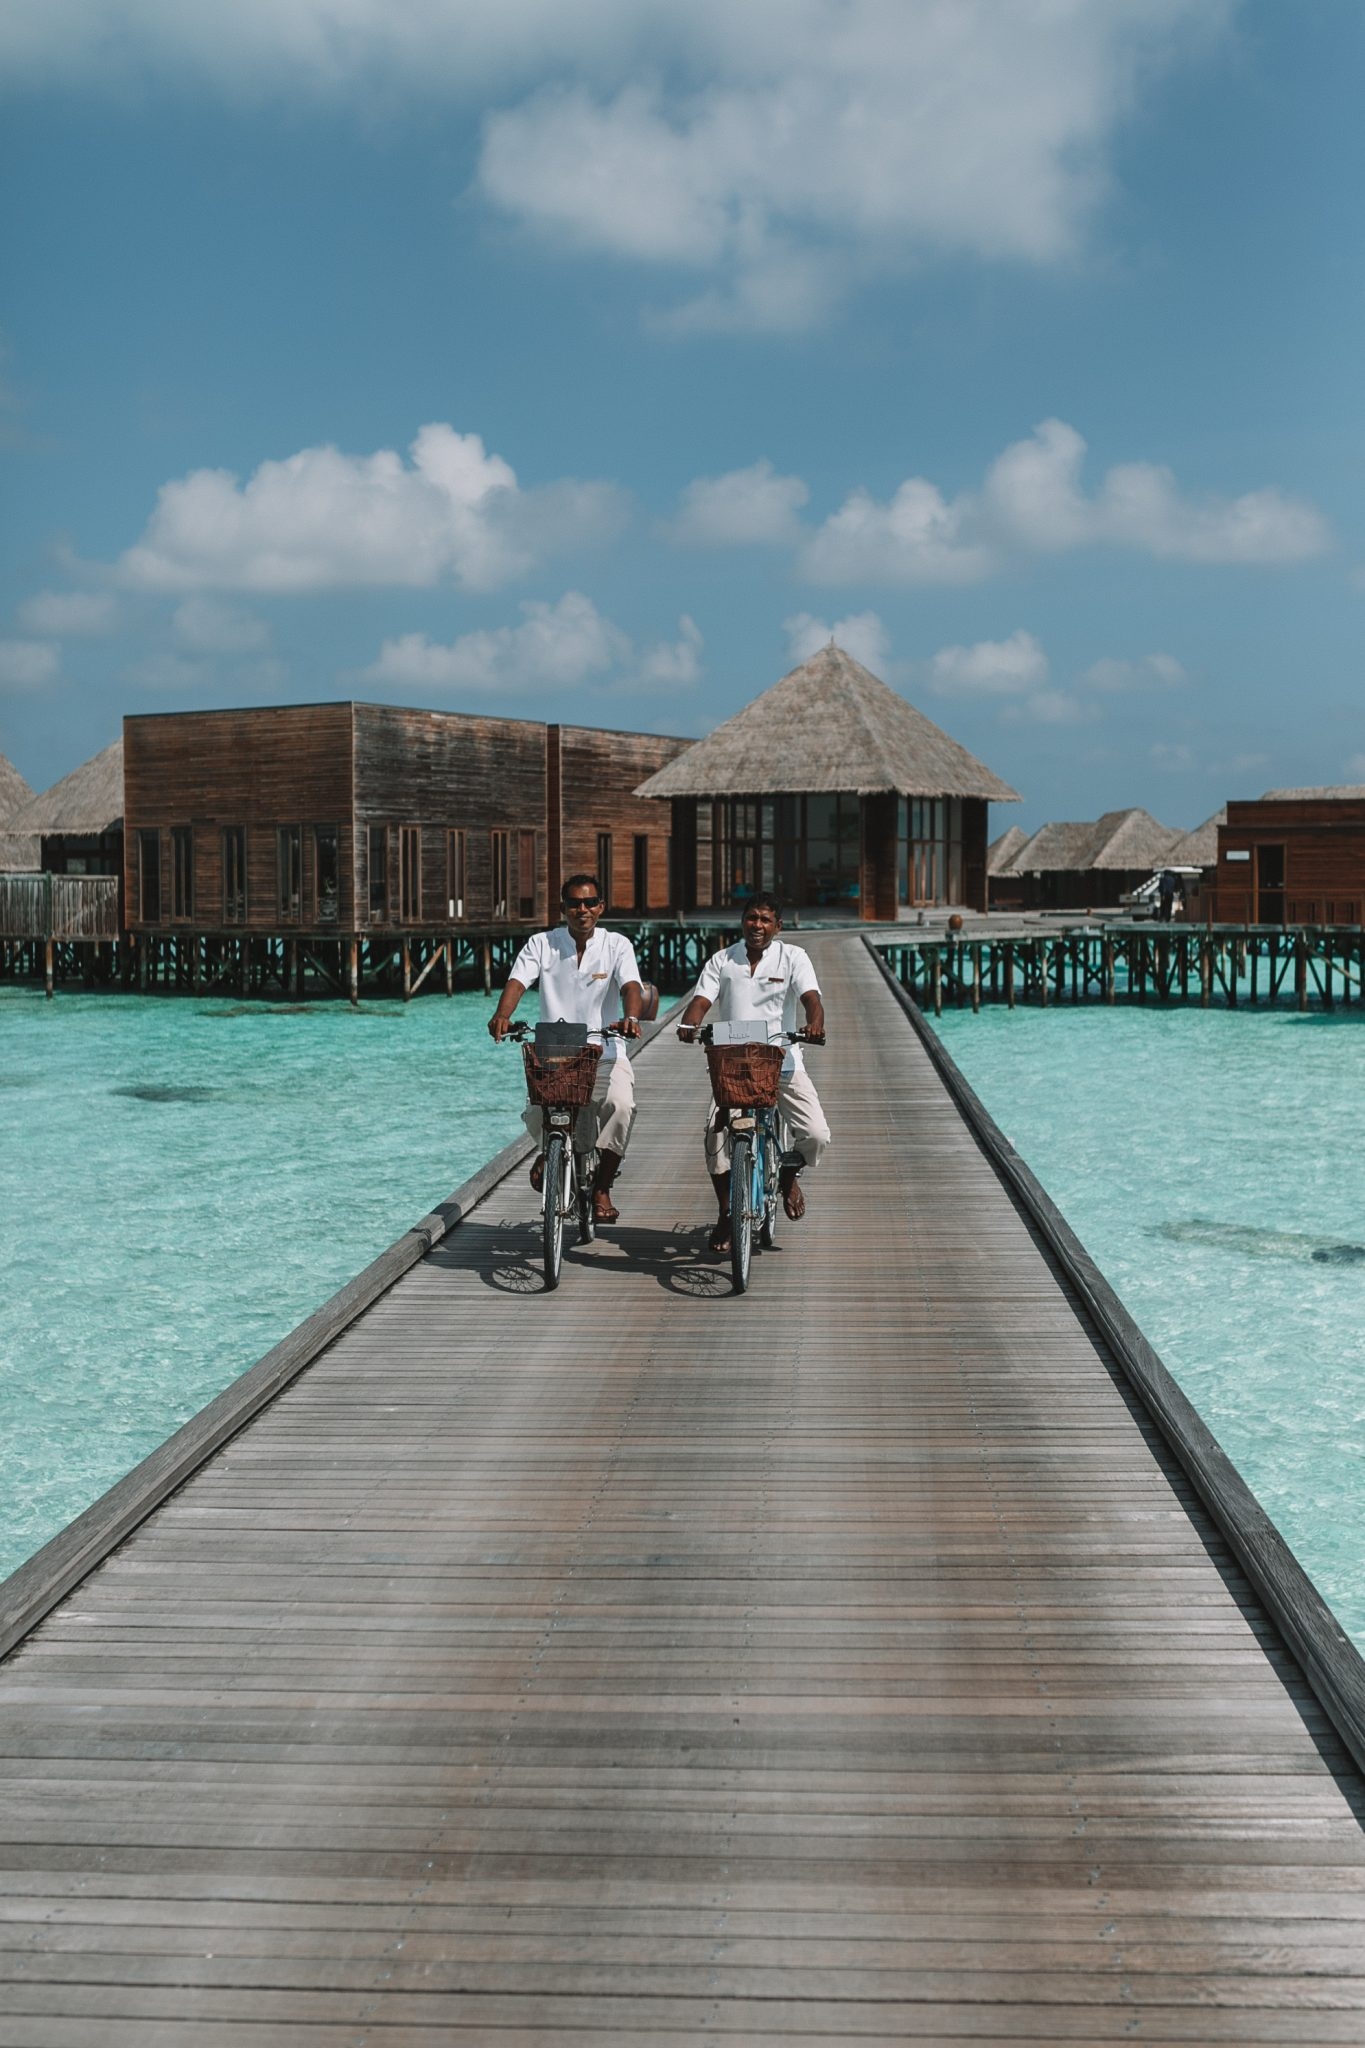 Two men riding bikes on a boardwalk in the Maldives